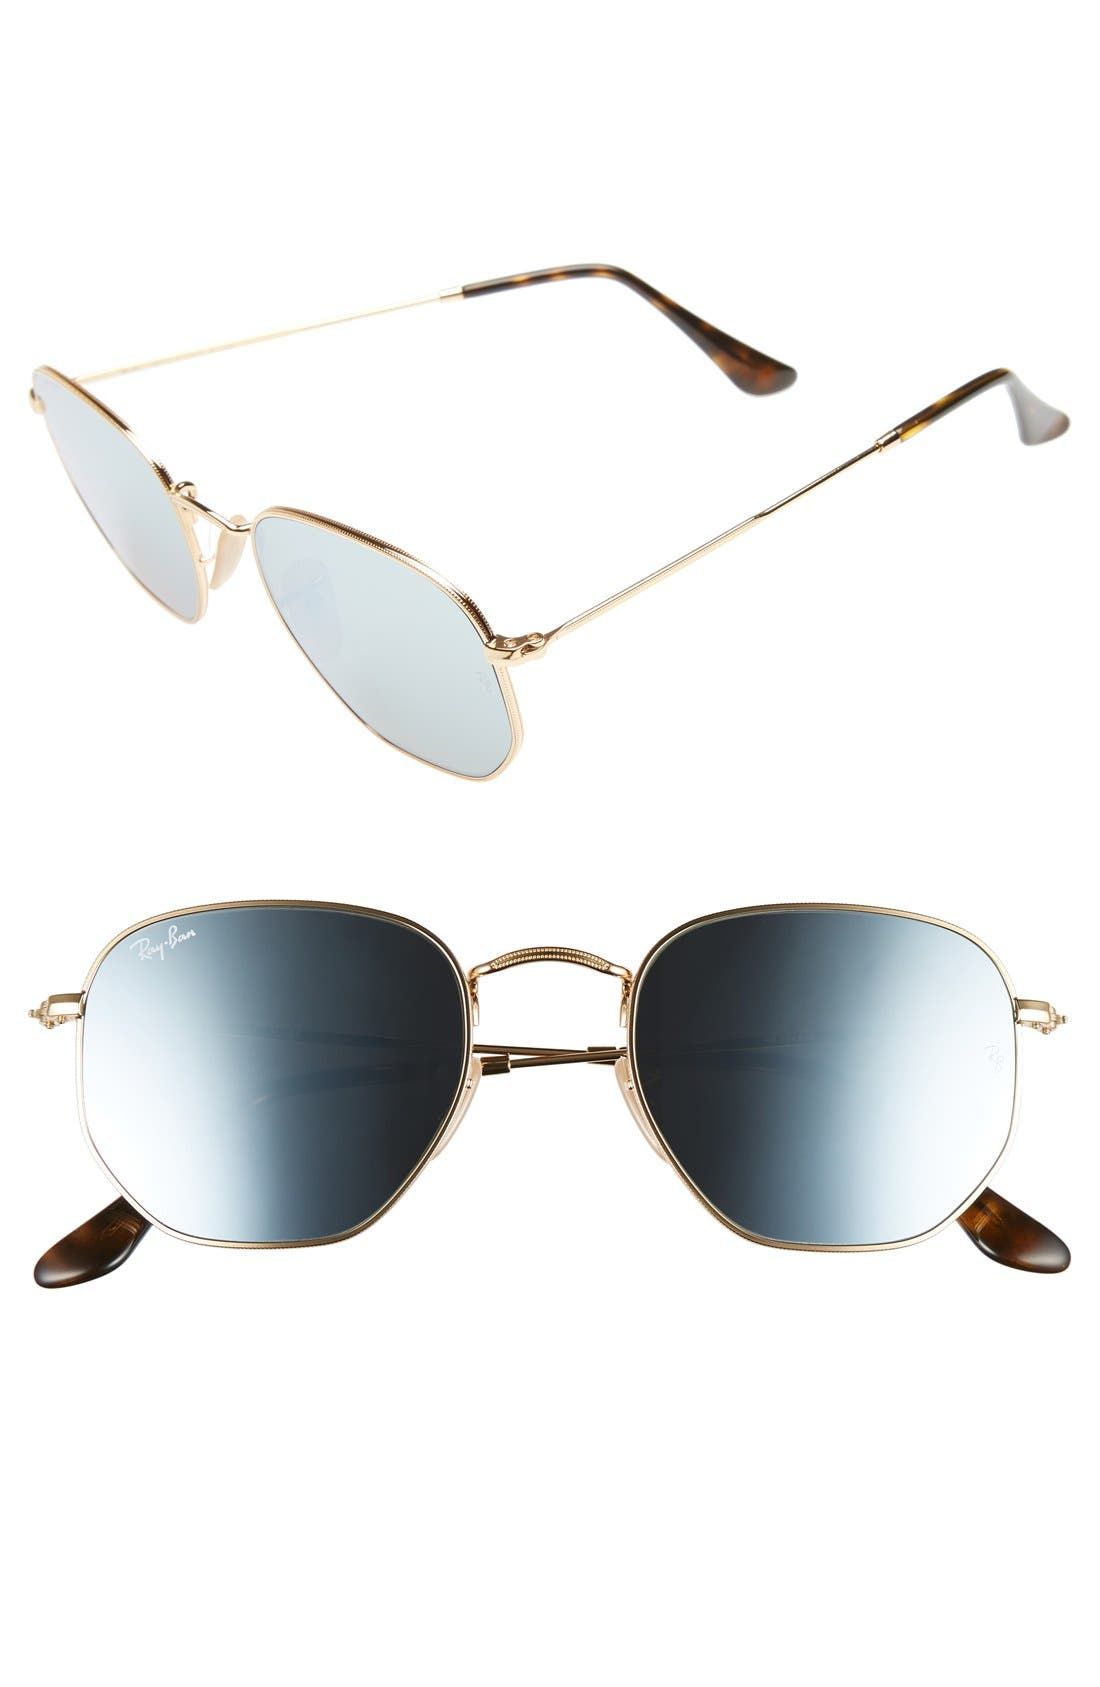 Ray-Ban Icons 51Mm Sunglasses -